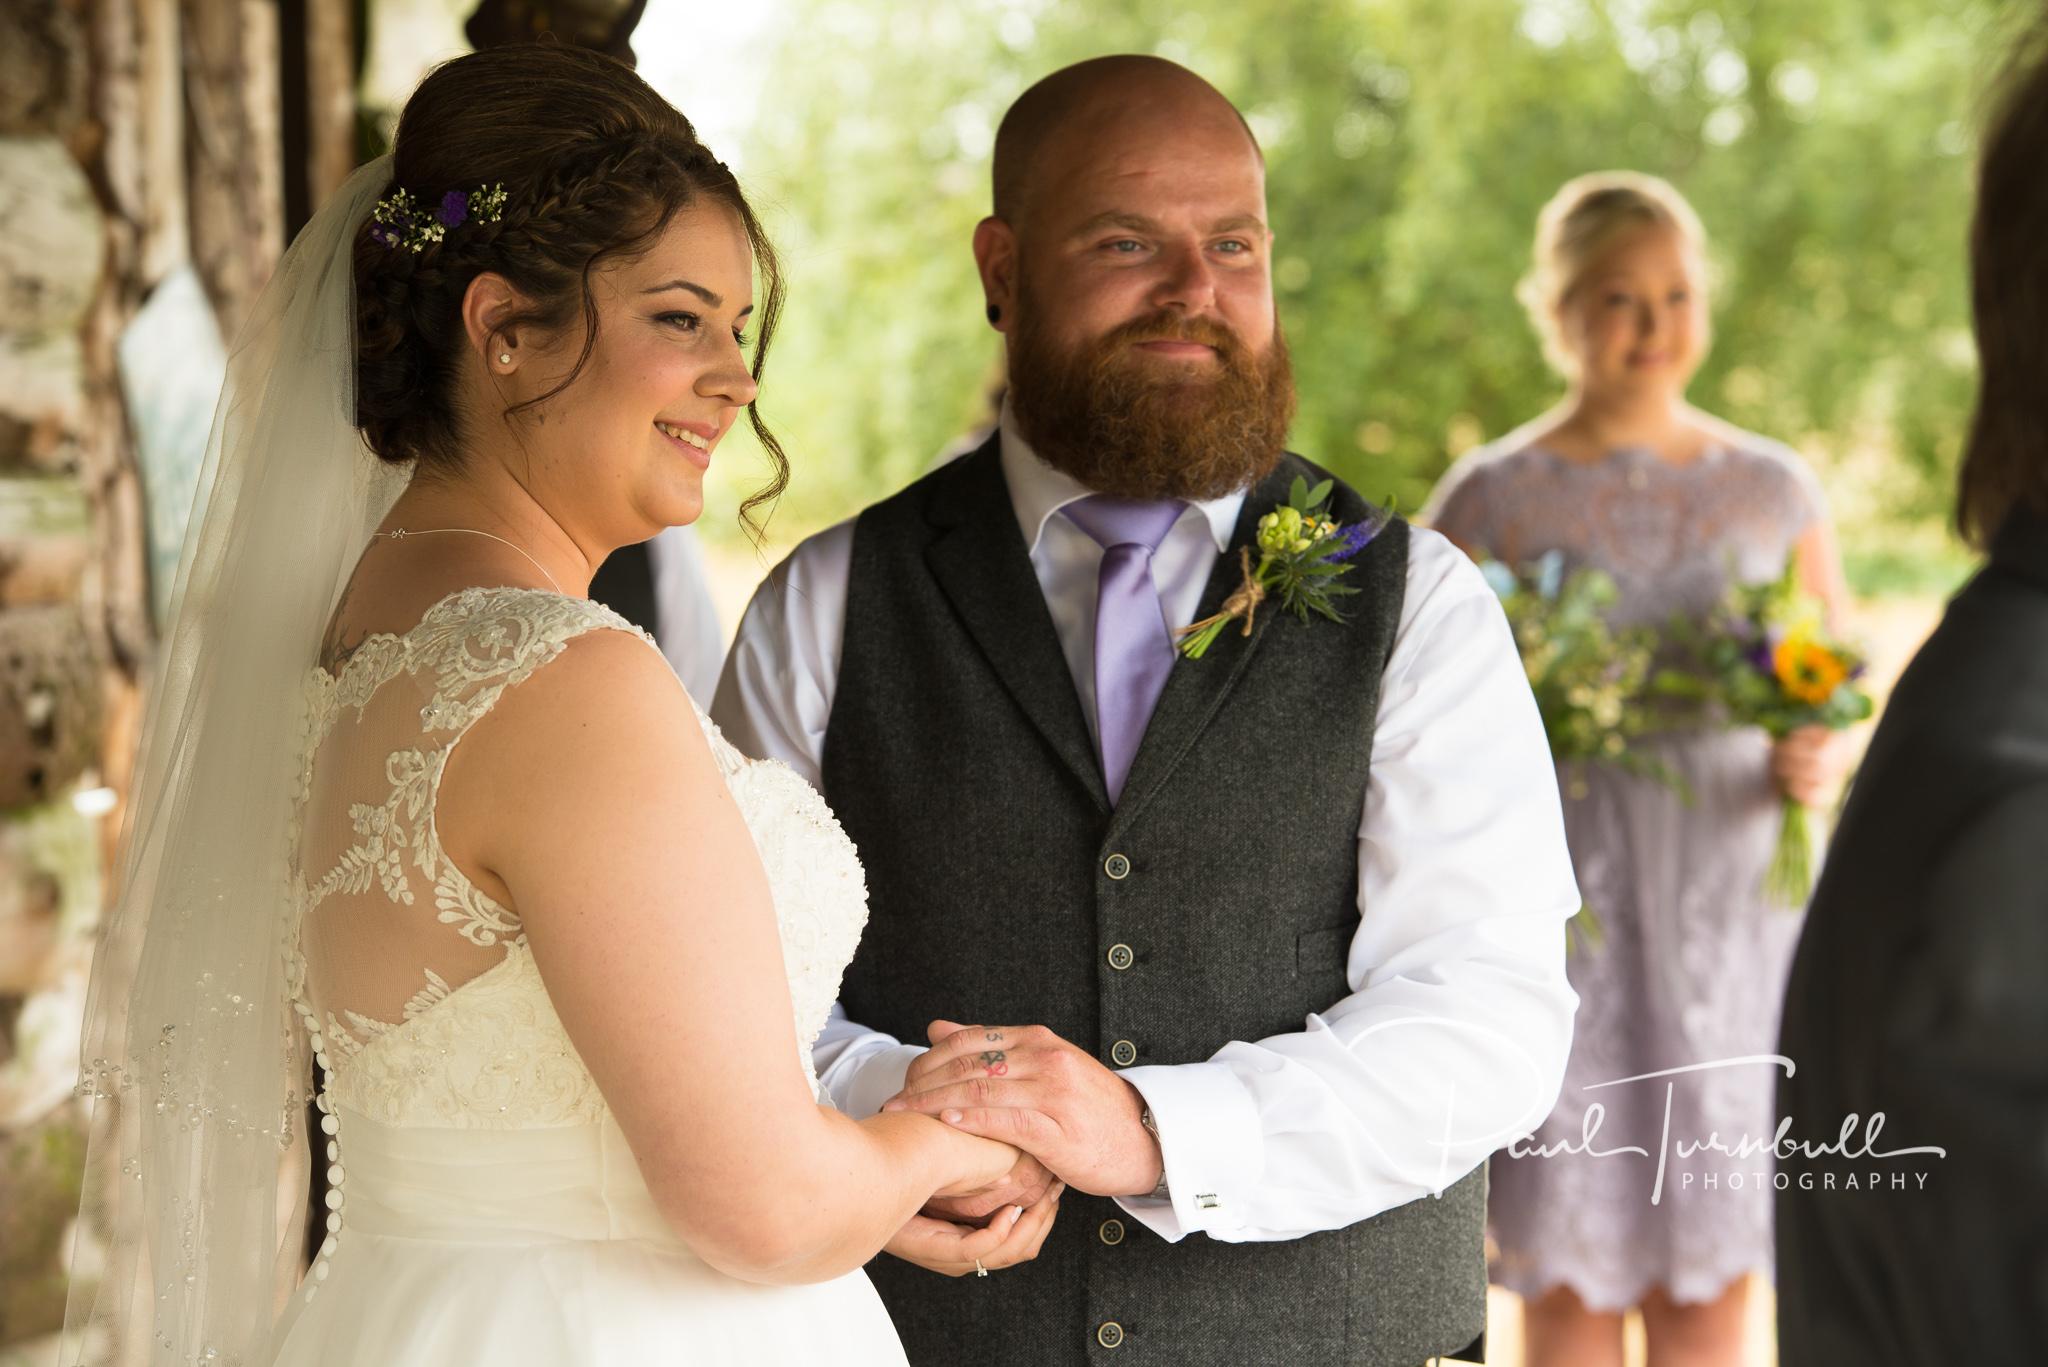 wedding-photographer-hilltop-farm-ilton-yorkshire-018.jpg